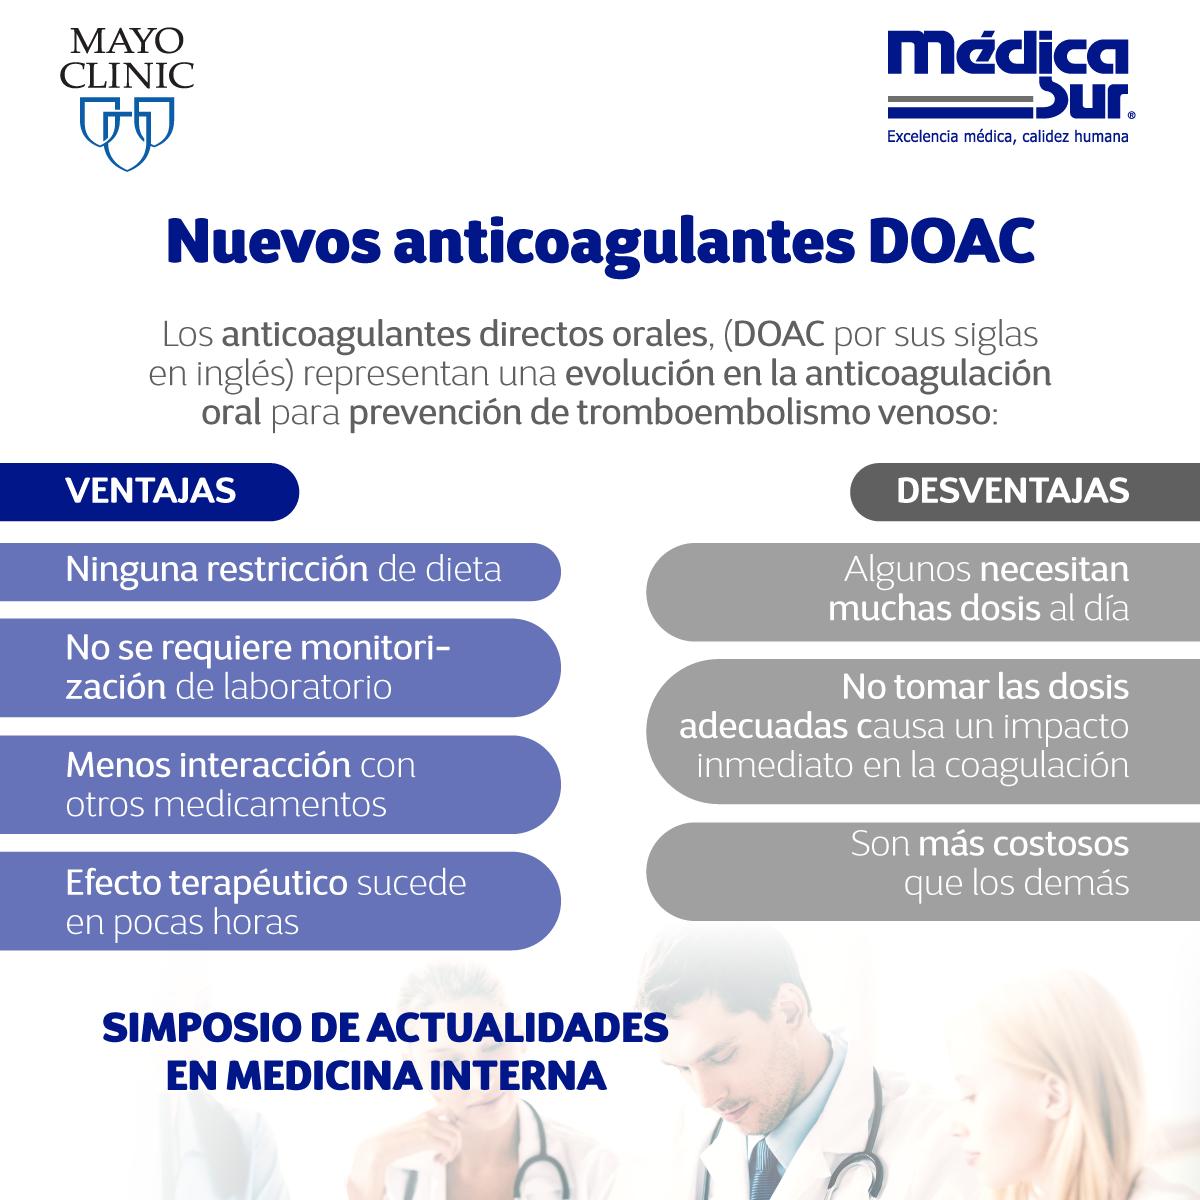 diabetes mayo clinic powerpoint